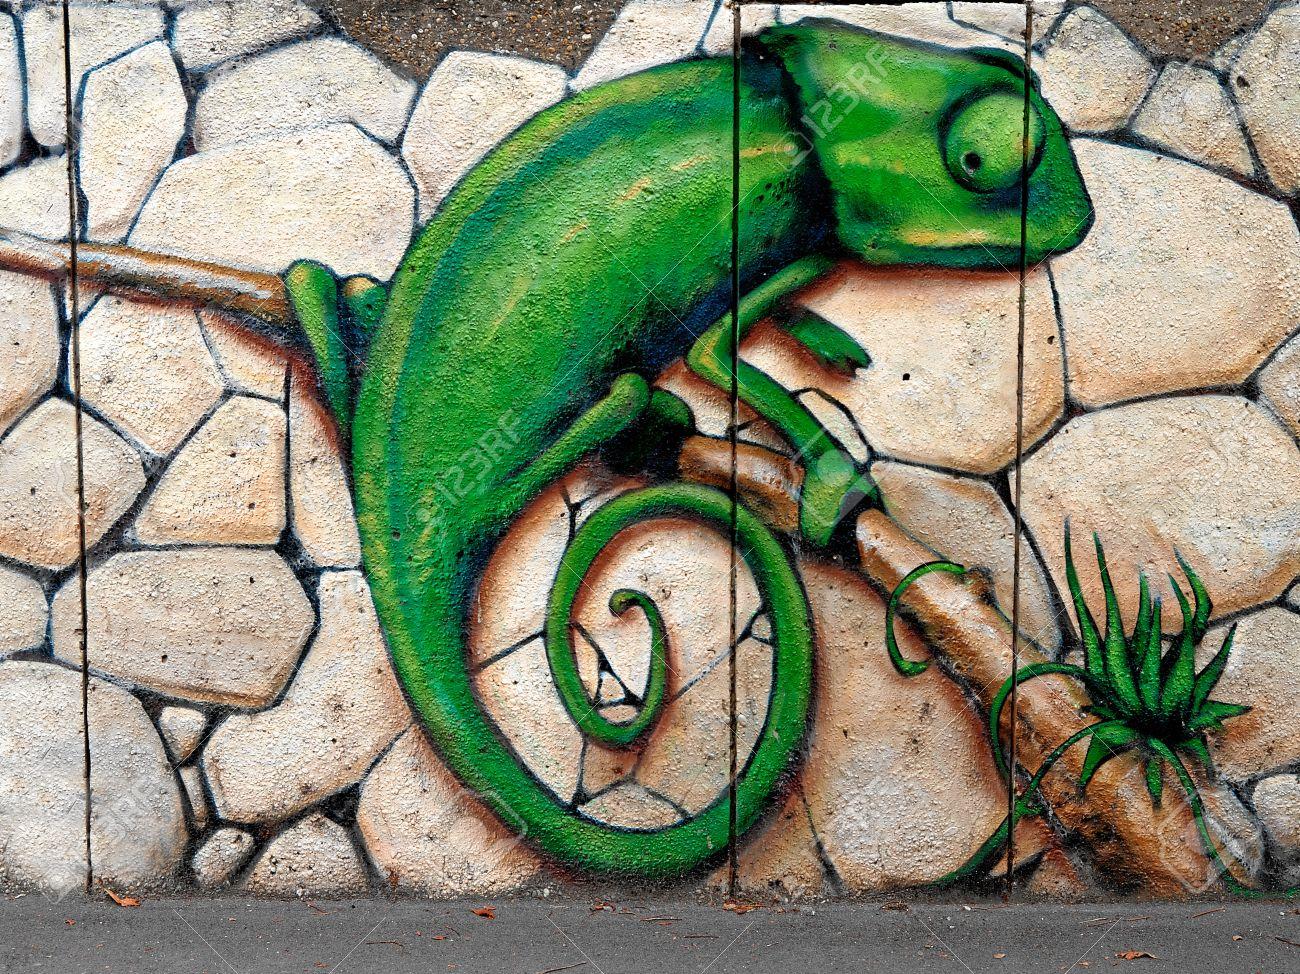 Wall Painting Graffiti Chameleon Sprite Graffiti Fest 2011